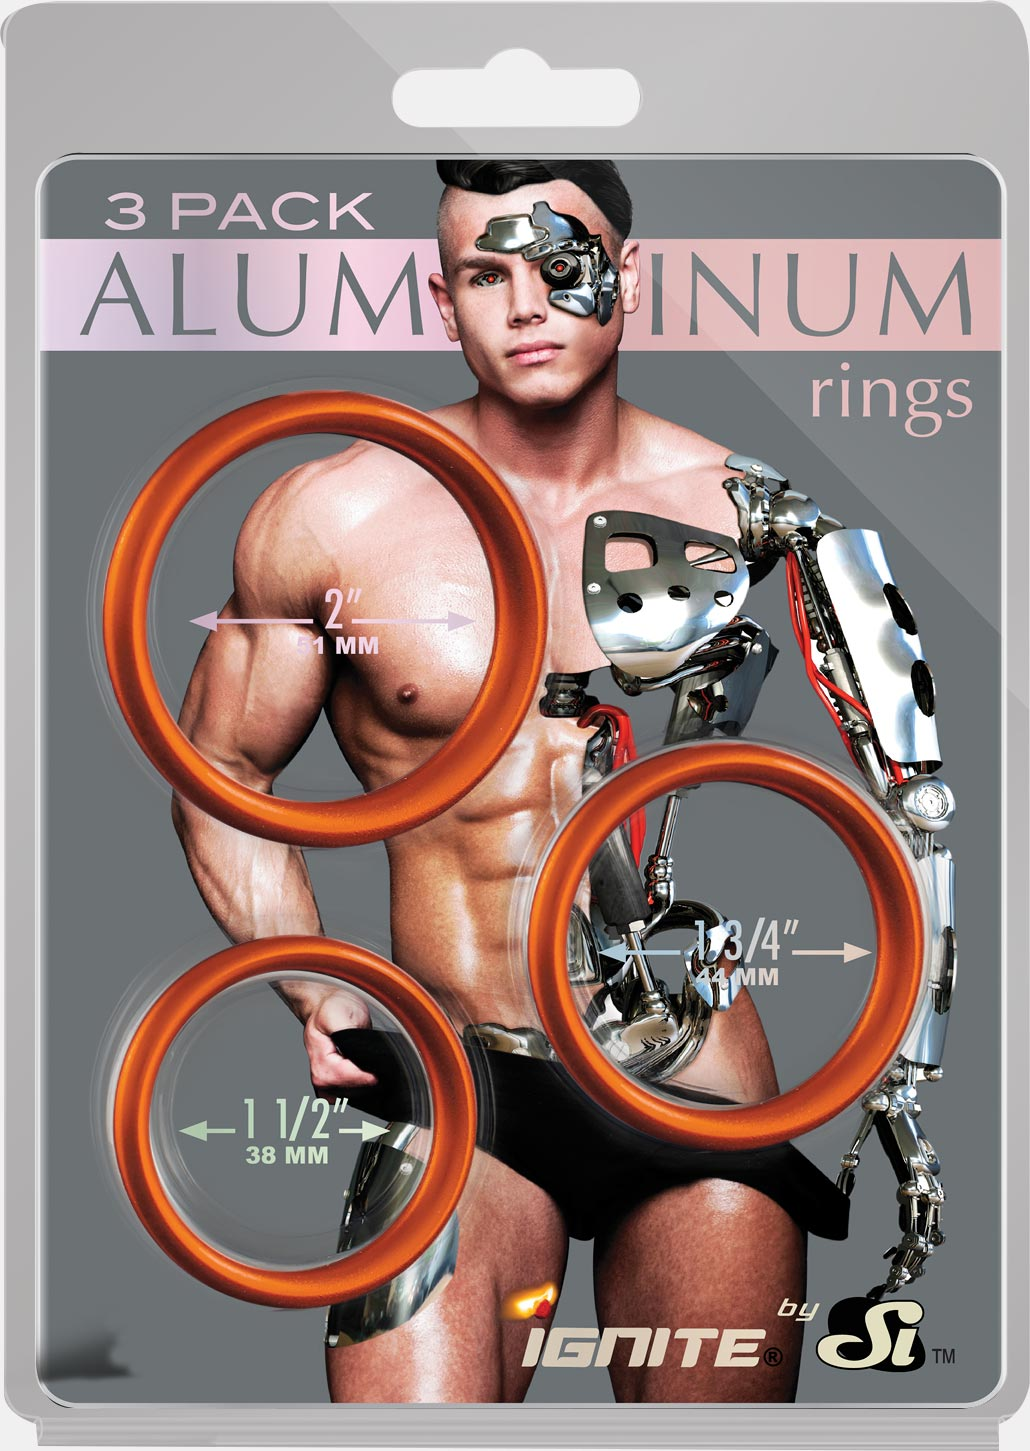 Aluminum Rings 3 Pack - Rust - 50, 45, 40 mm. (1.5, 1.75, 2.